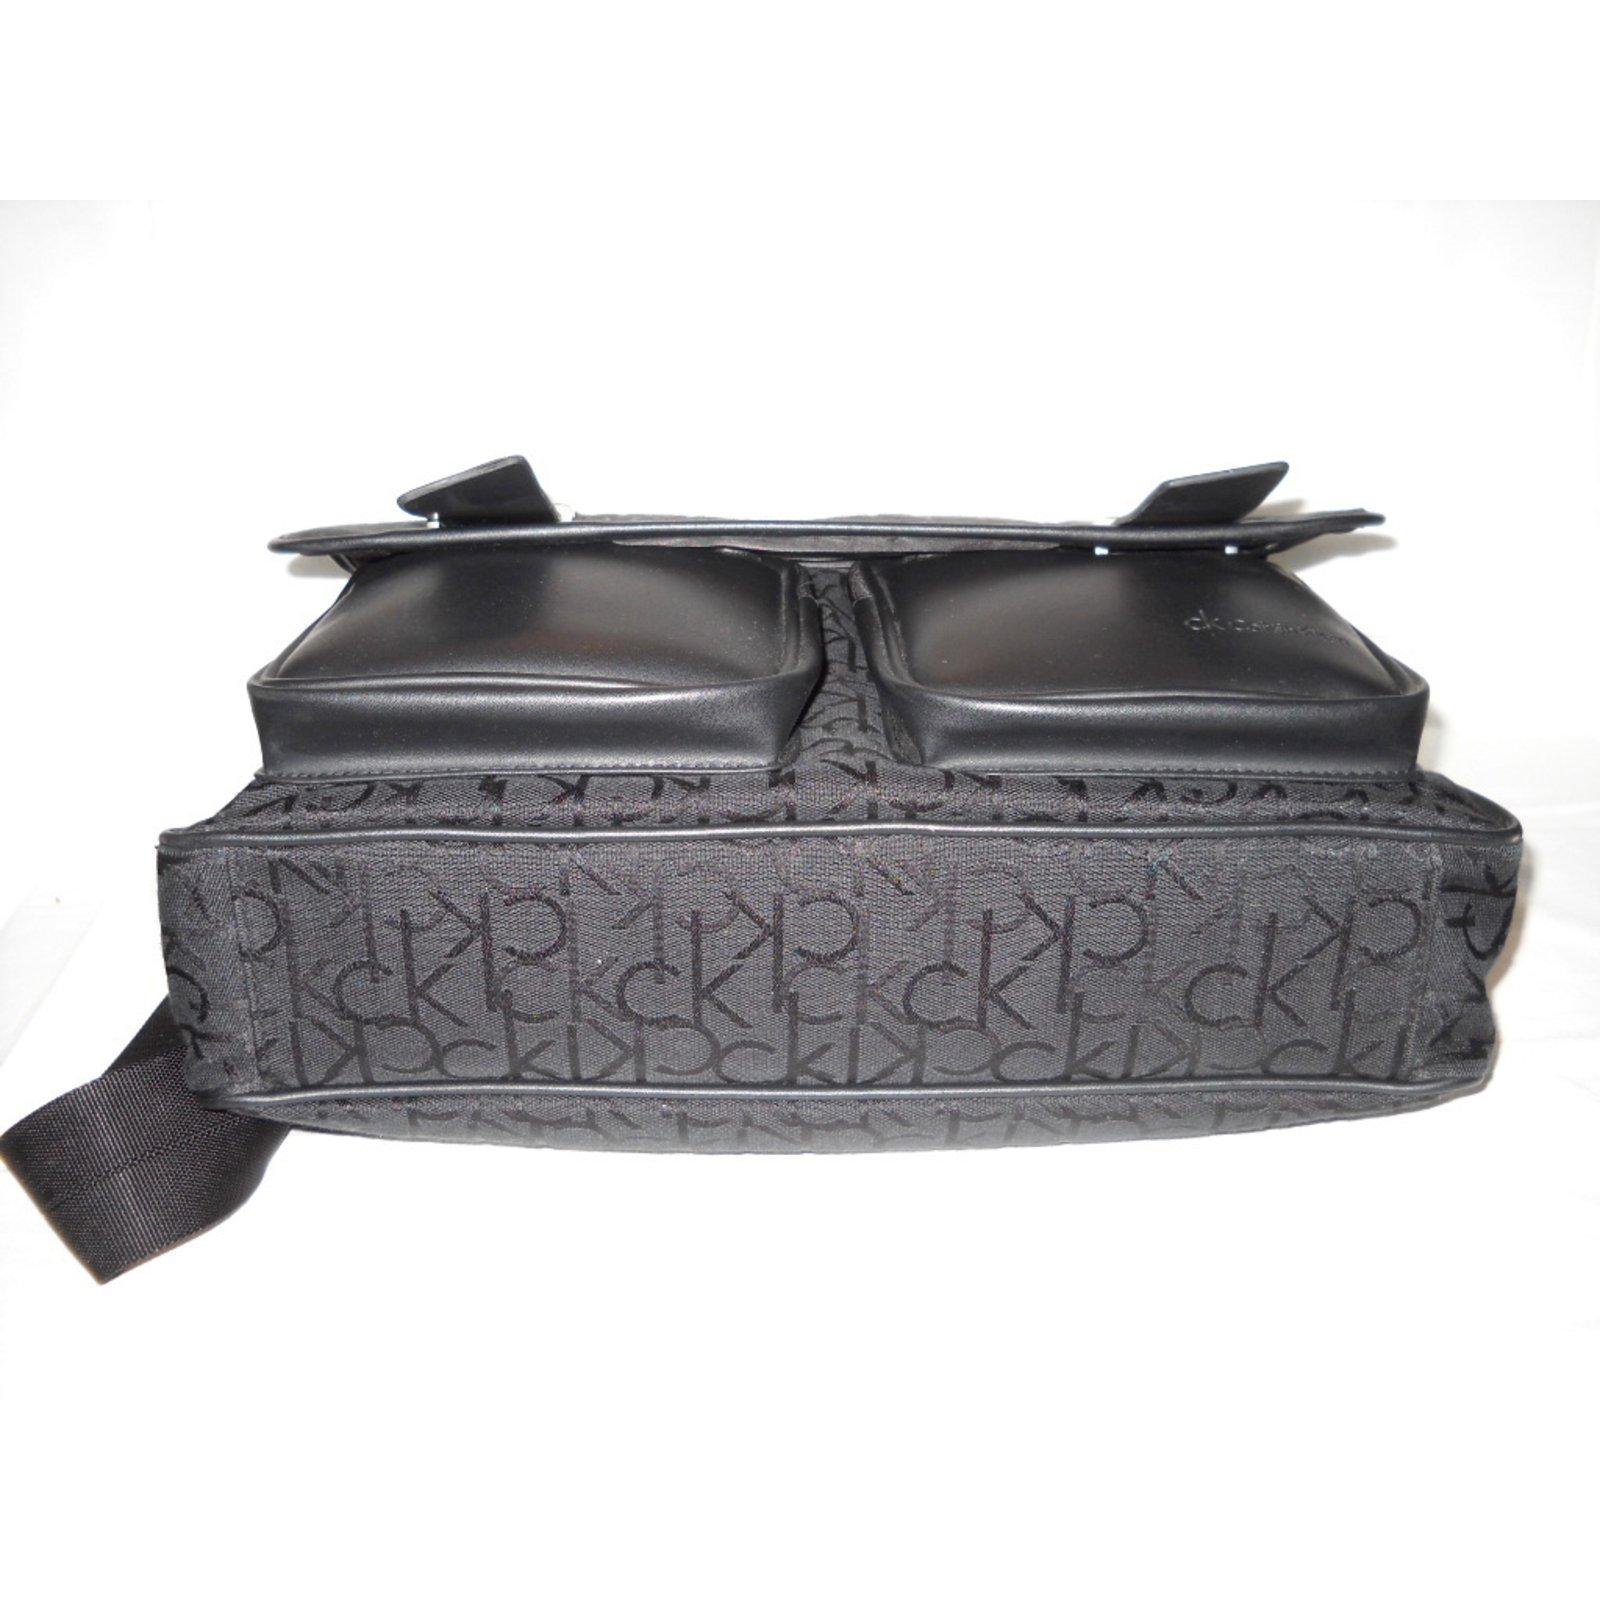 Bandouliere Ref Tissu Calvin Joli Noir Sacs Closet Sac 25394 Klein pxwBIcYt